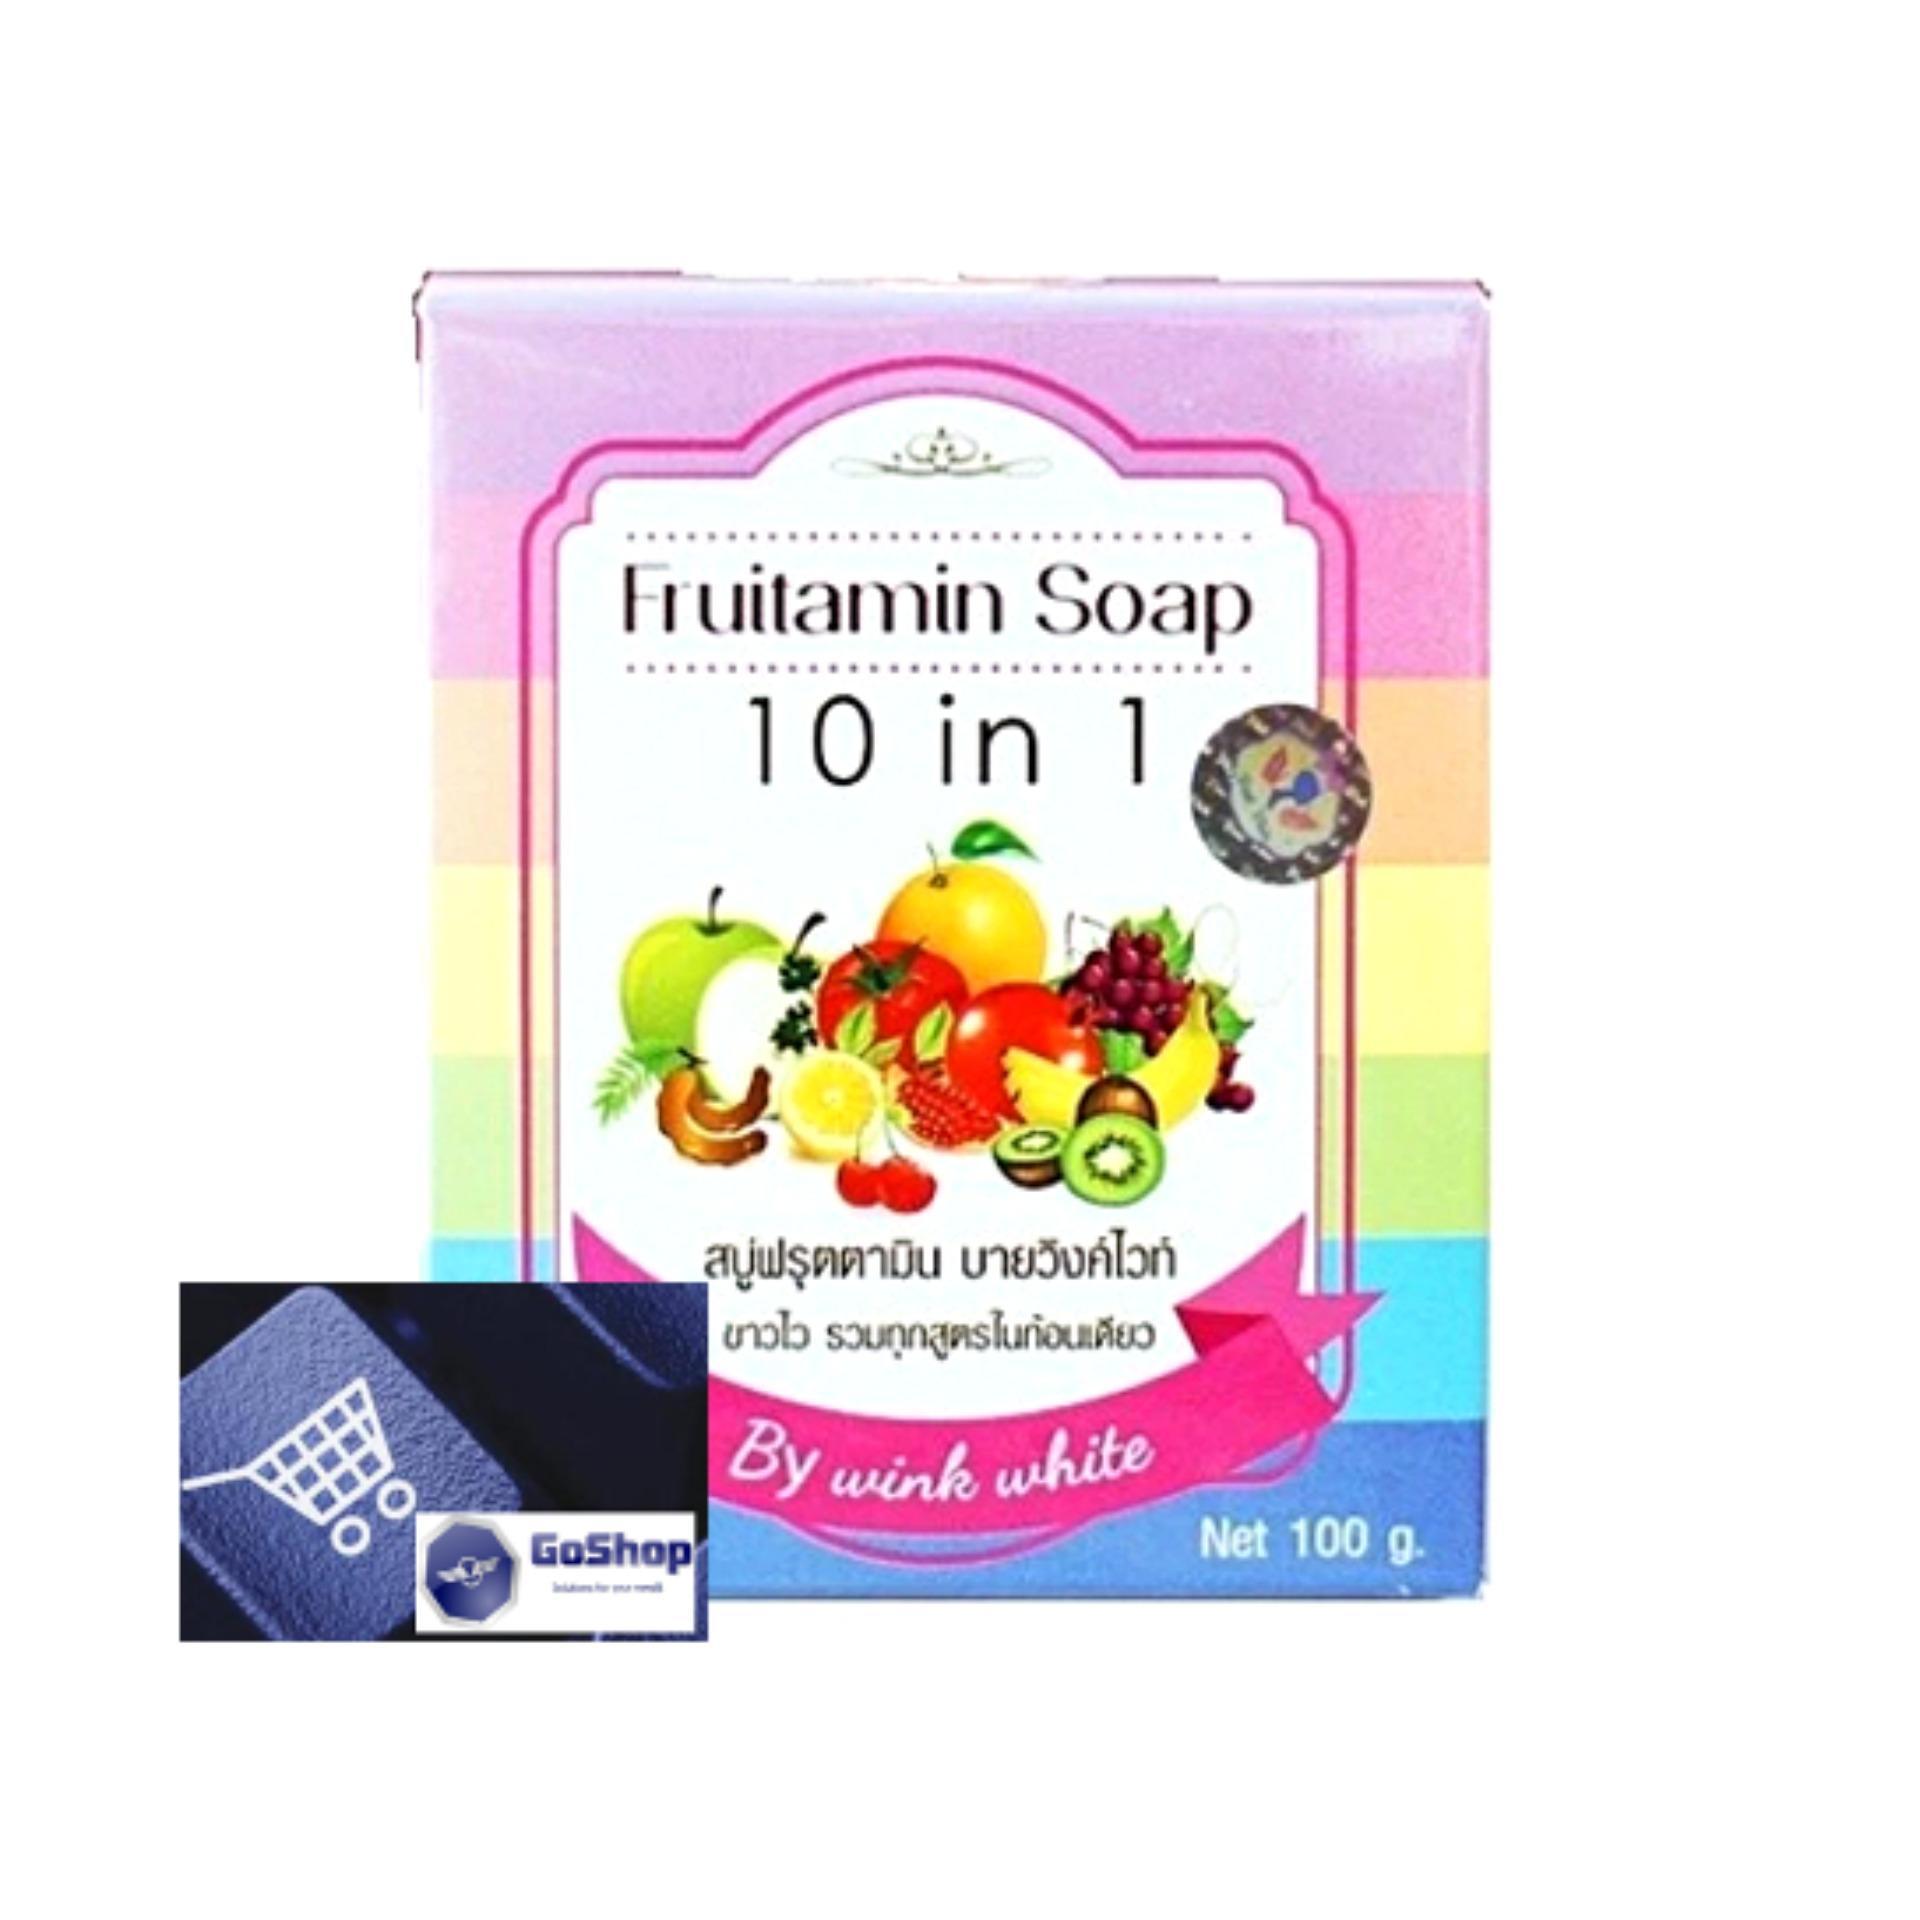 Harga preferensial Wink White GoShop Fruitamin Soap 10 in 1 - 100gr beli sekarang - Hanya